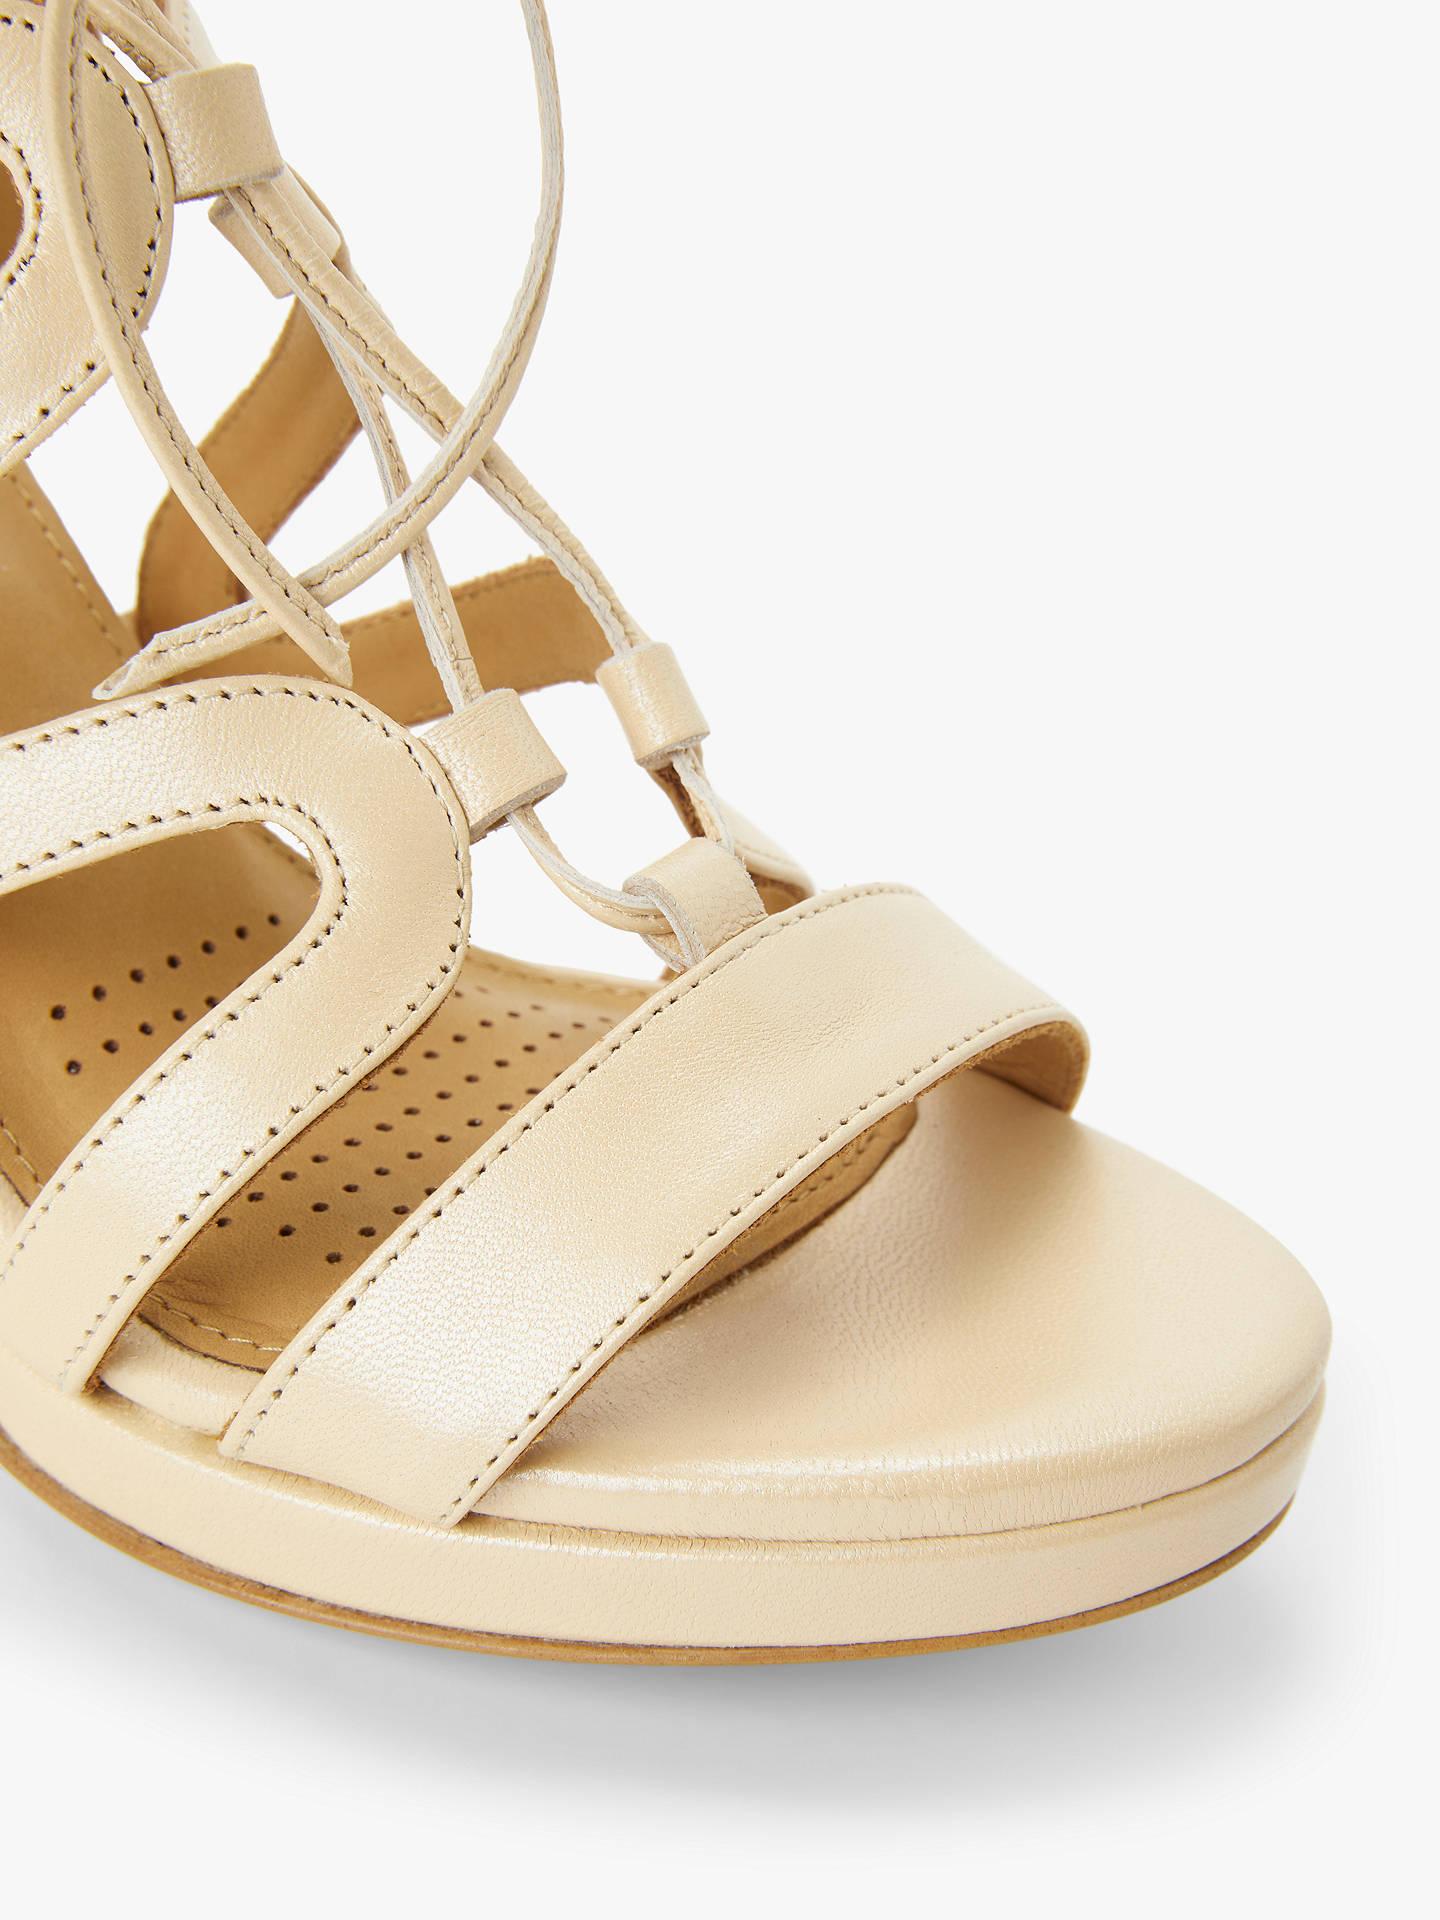 b987ebeeb221 ... Buy Sargossa Chic Lace Up Stiletto Heel Sandals